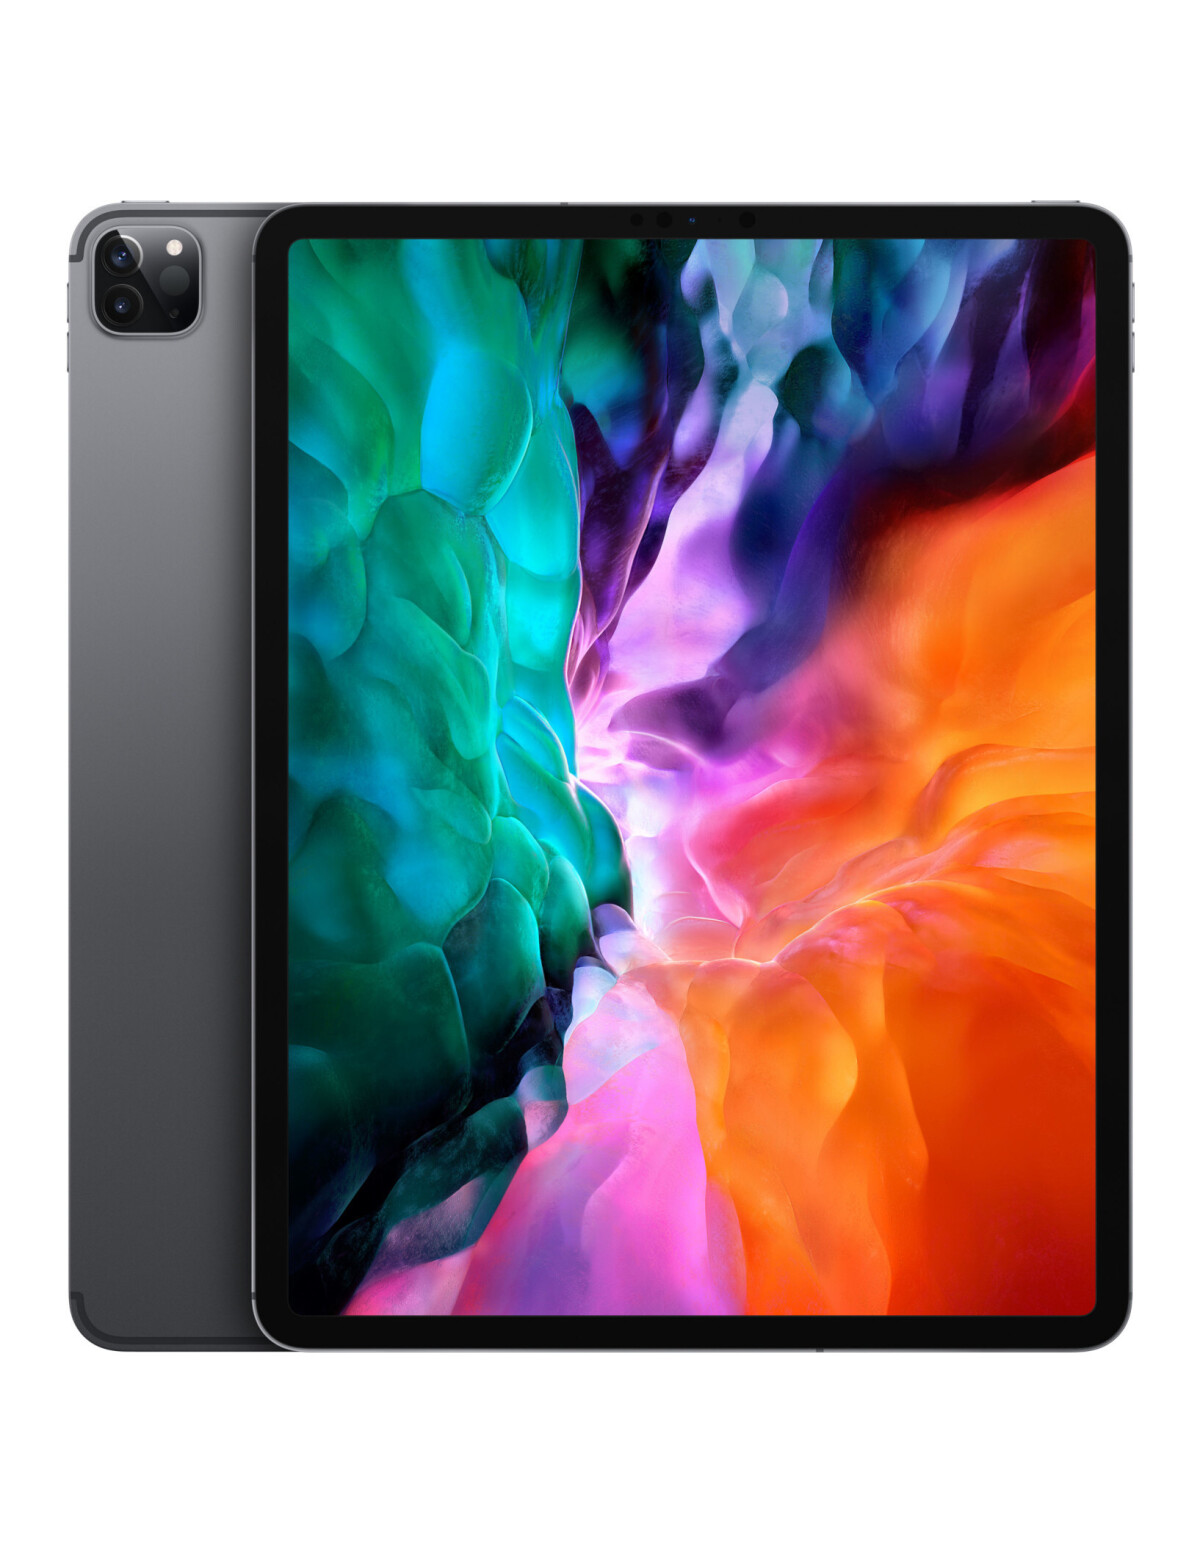 Apple iPad Pro 12.9-inch (2020) specs - PhoneArena